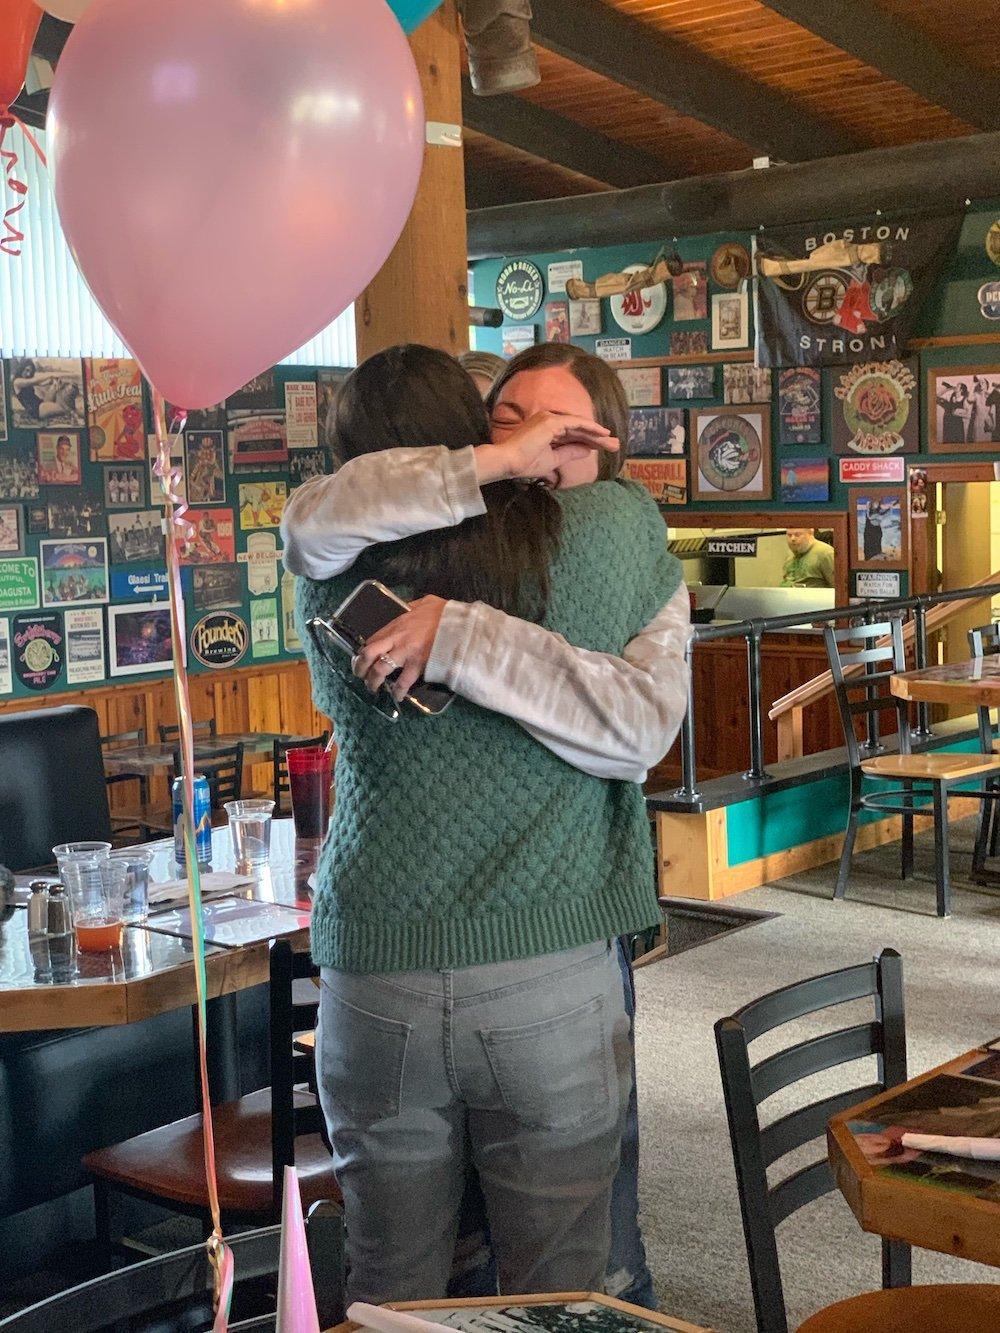 13 Readers Share Their Joyful Reunions